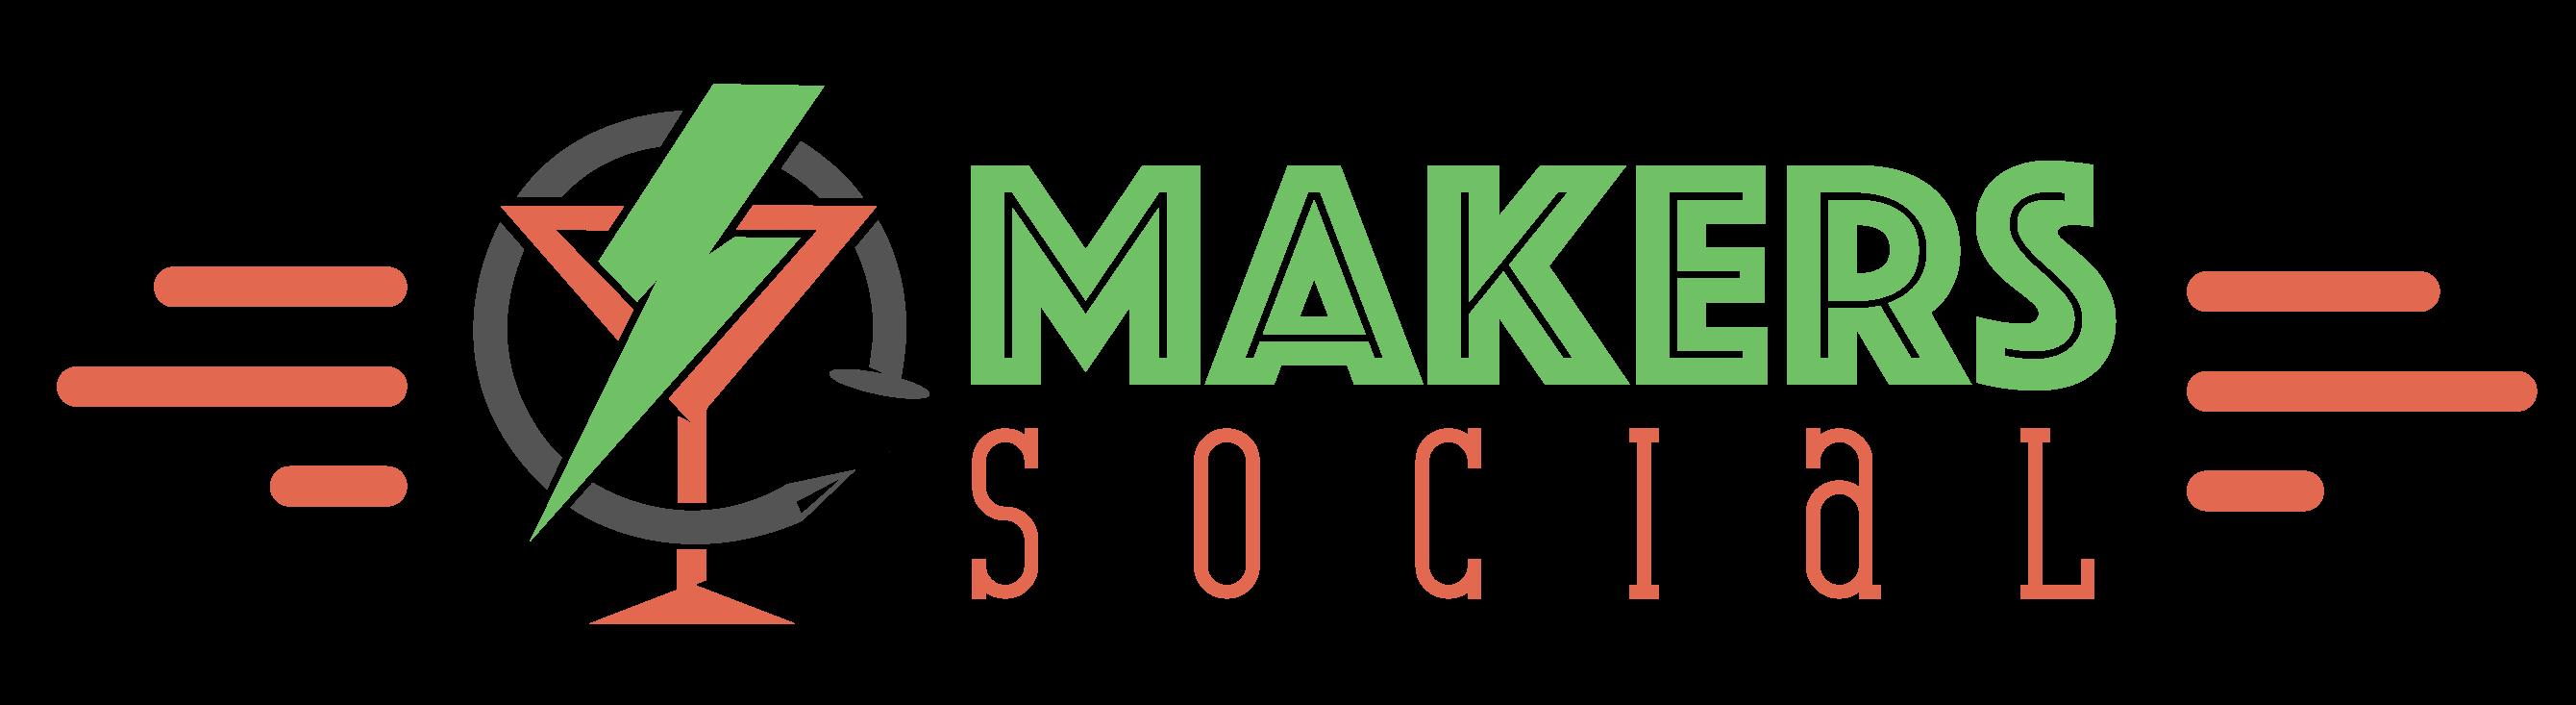 makers-social-long-noback.png